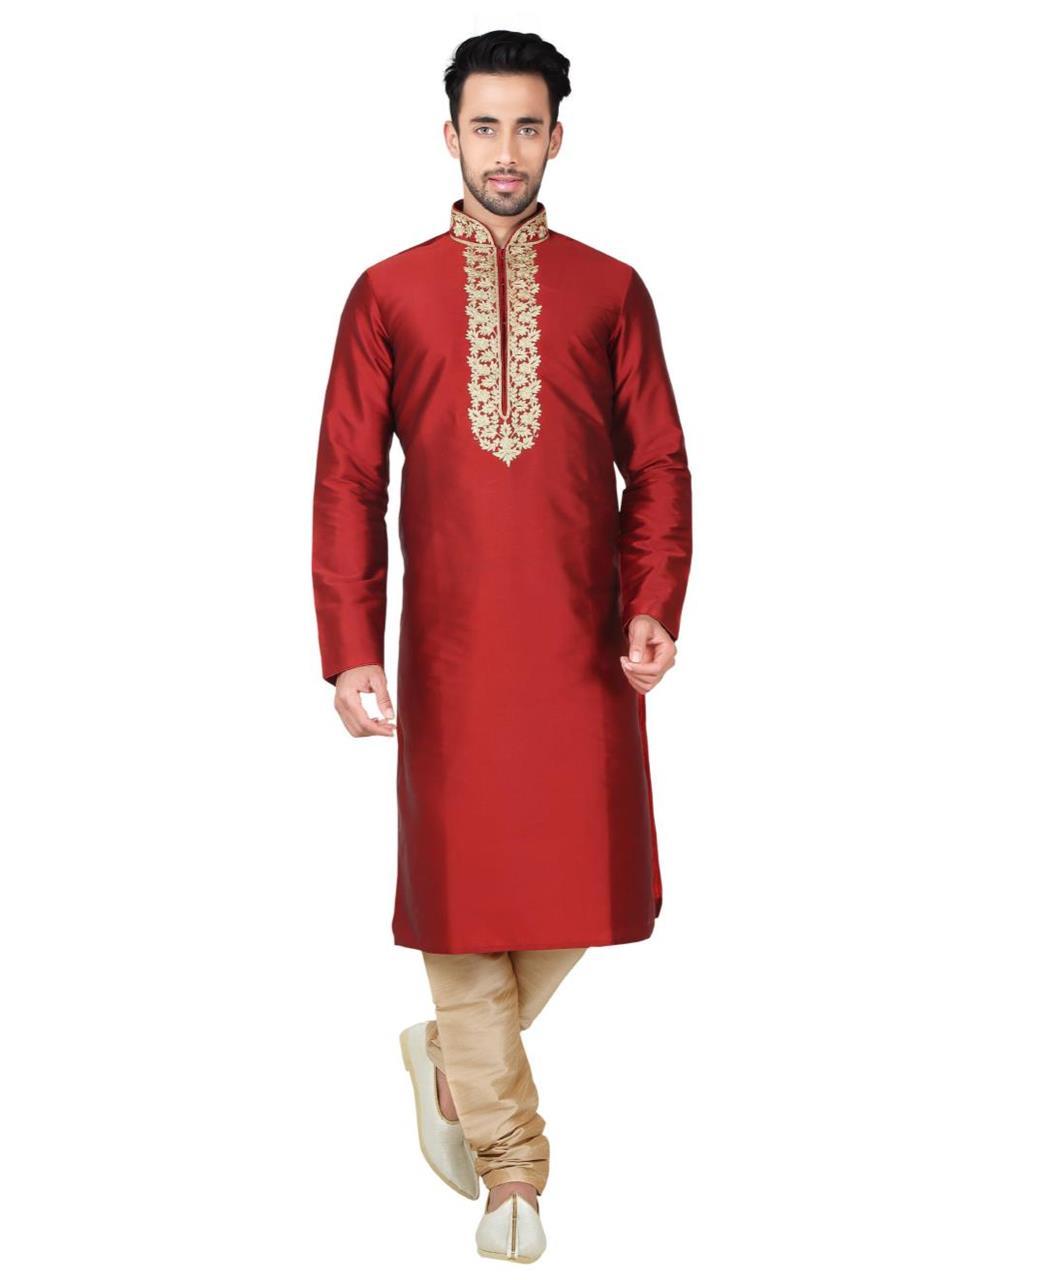 d1fb701be4 Embroidered Bangalore Silk Maroon Kurta Pajama